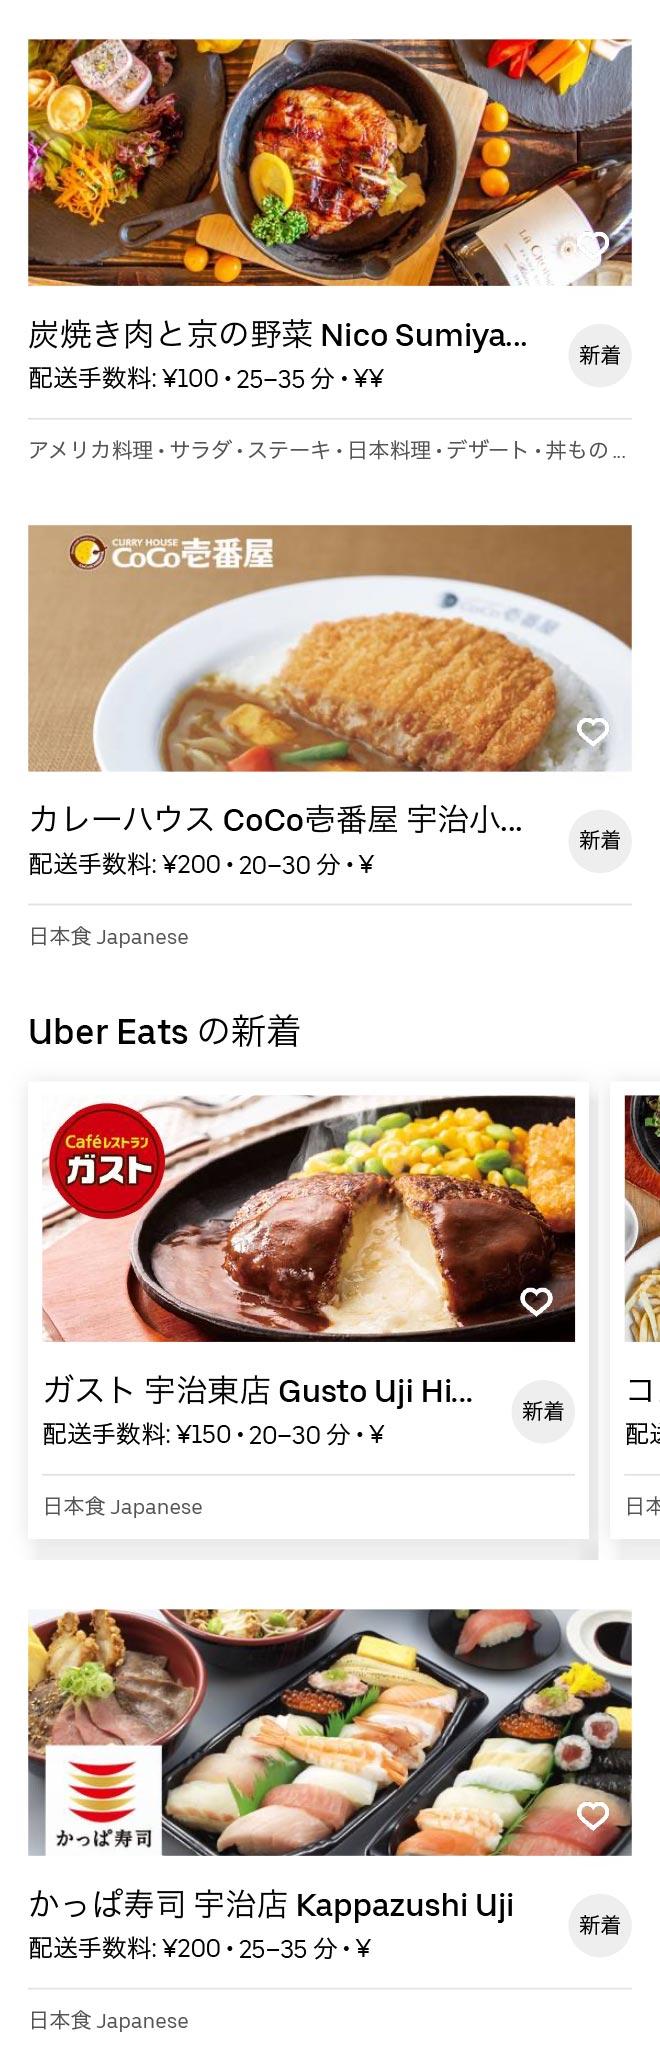 Uji menu 2005 02